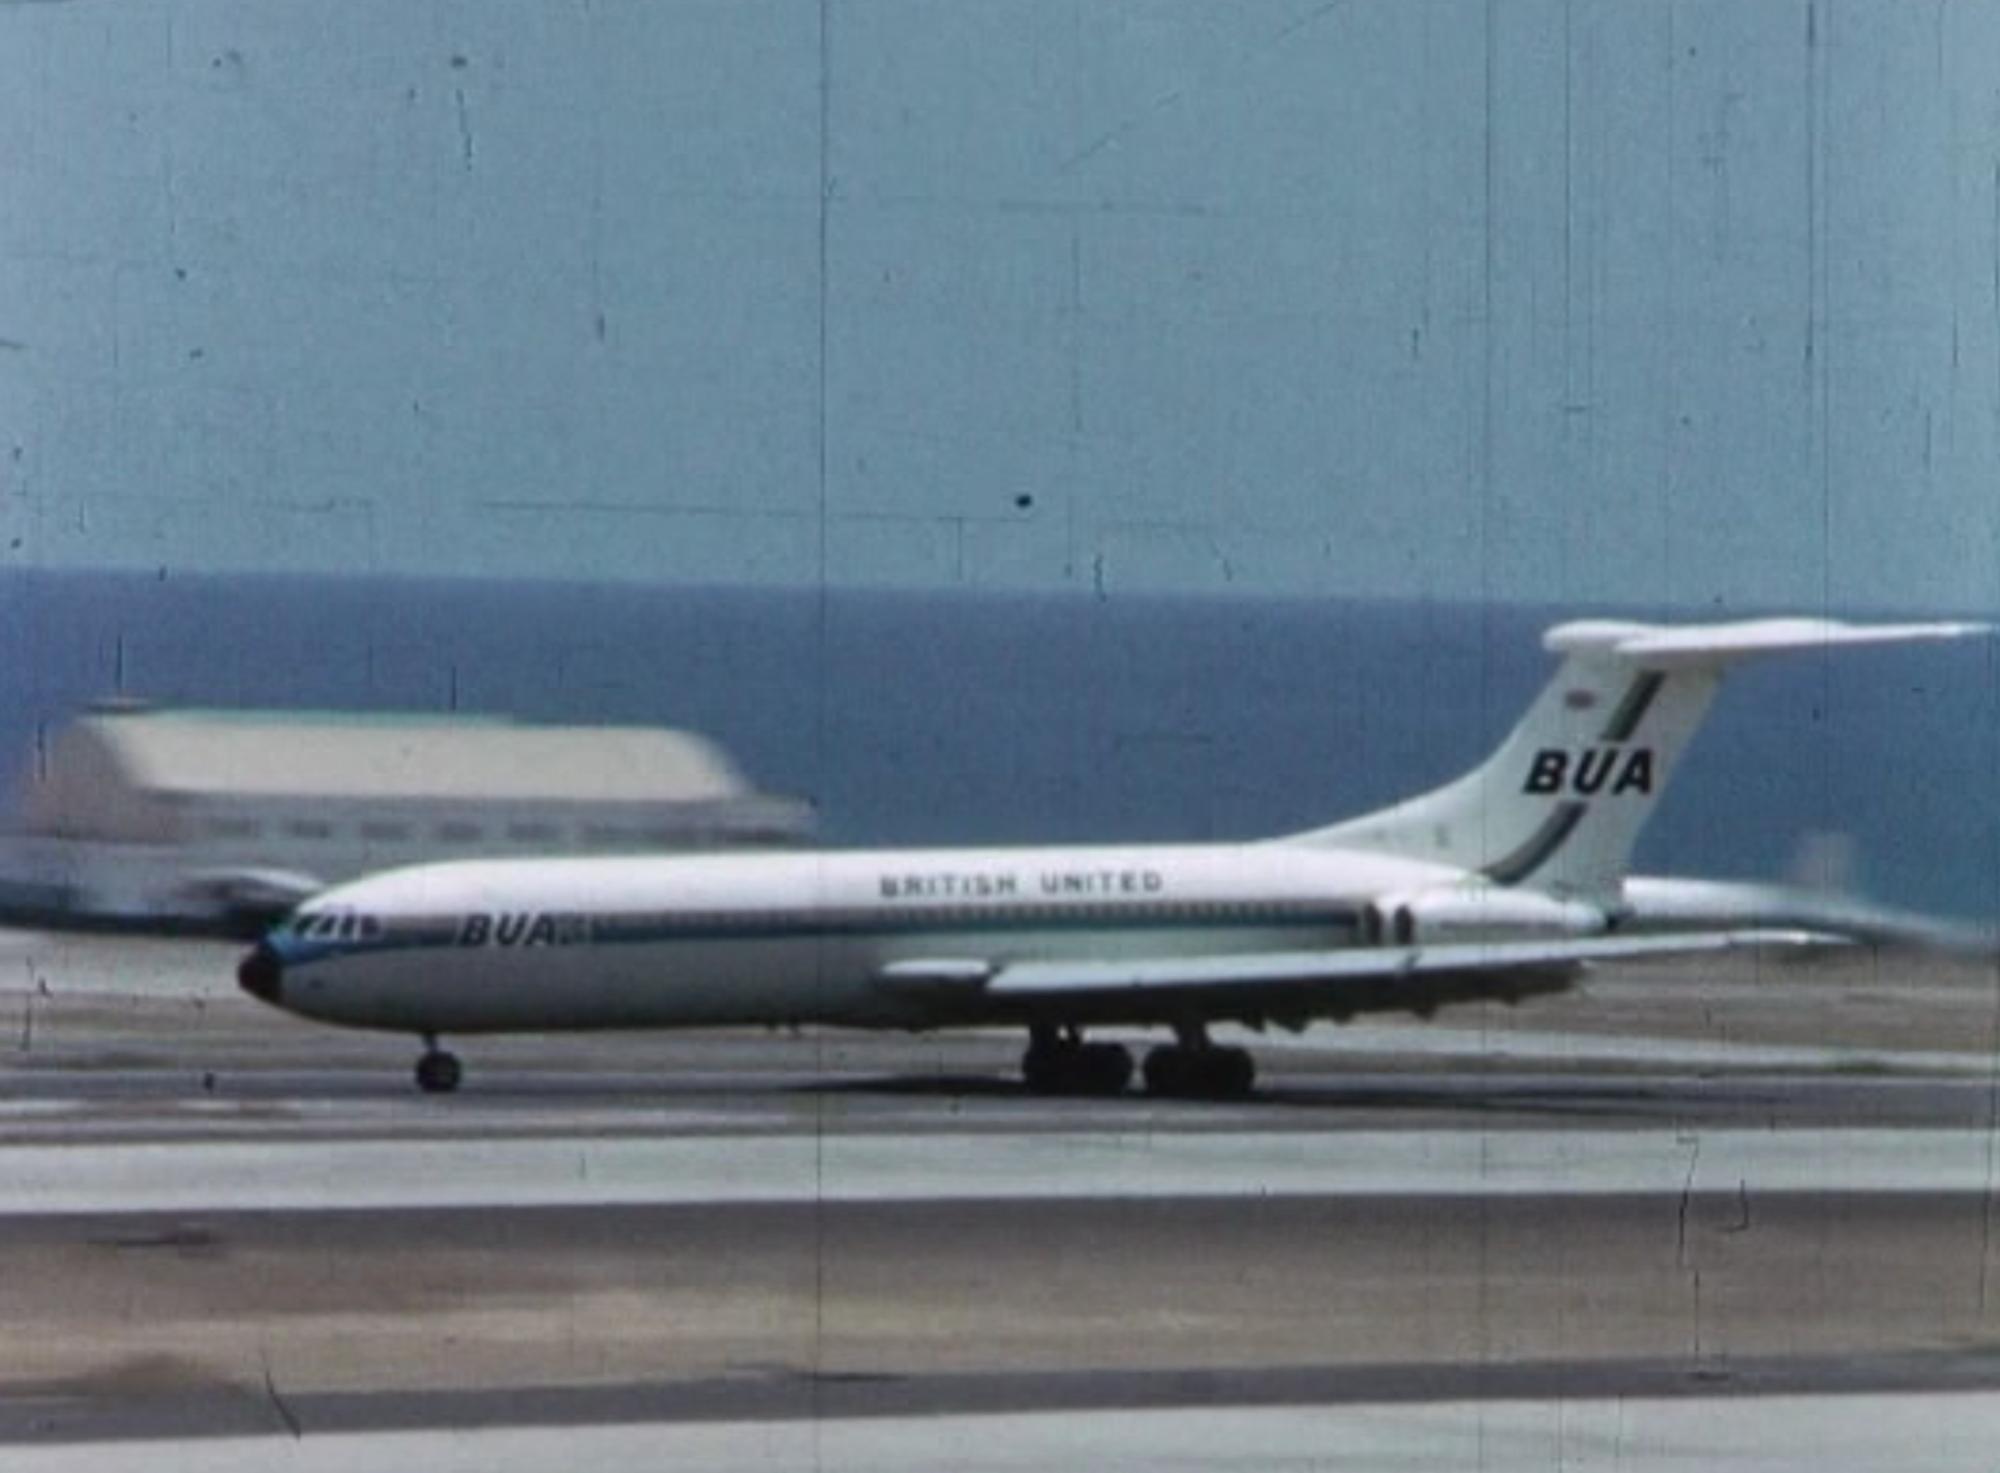 BUA plane taking off